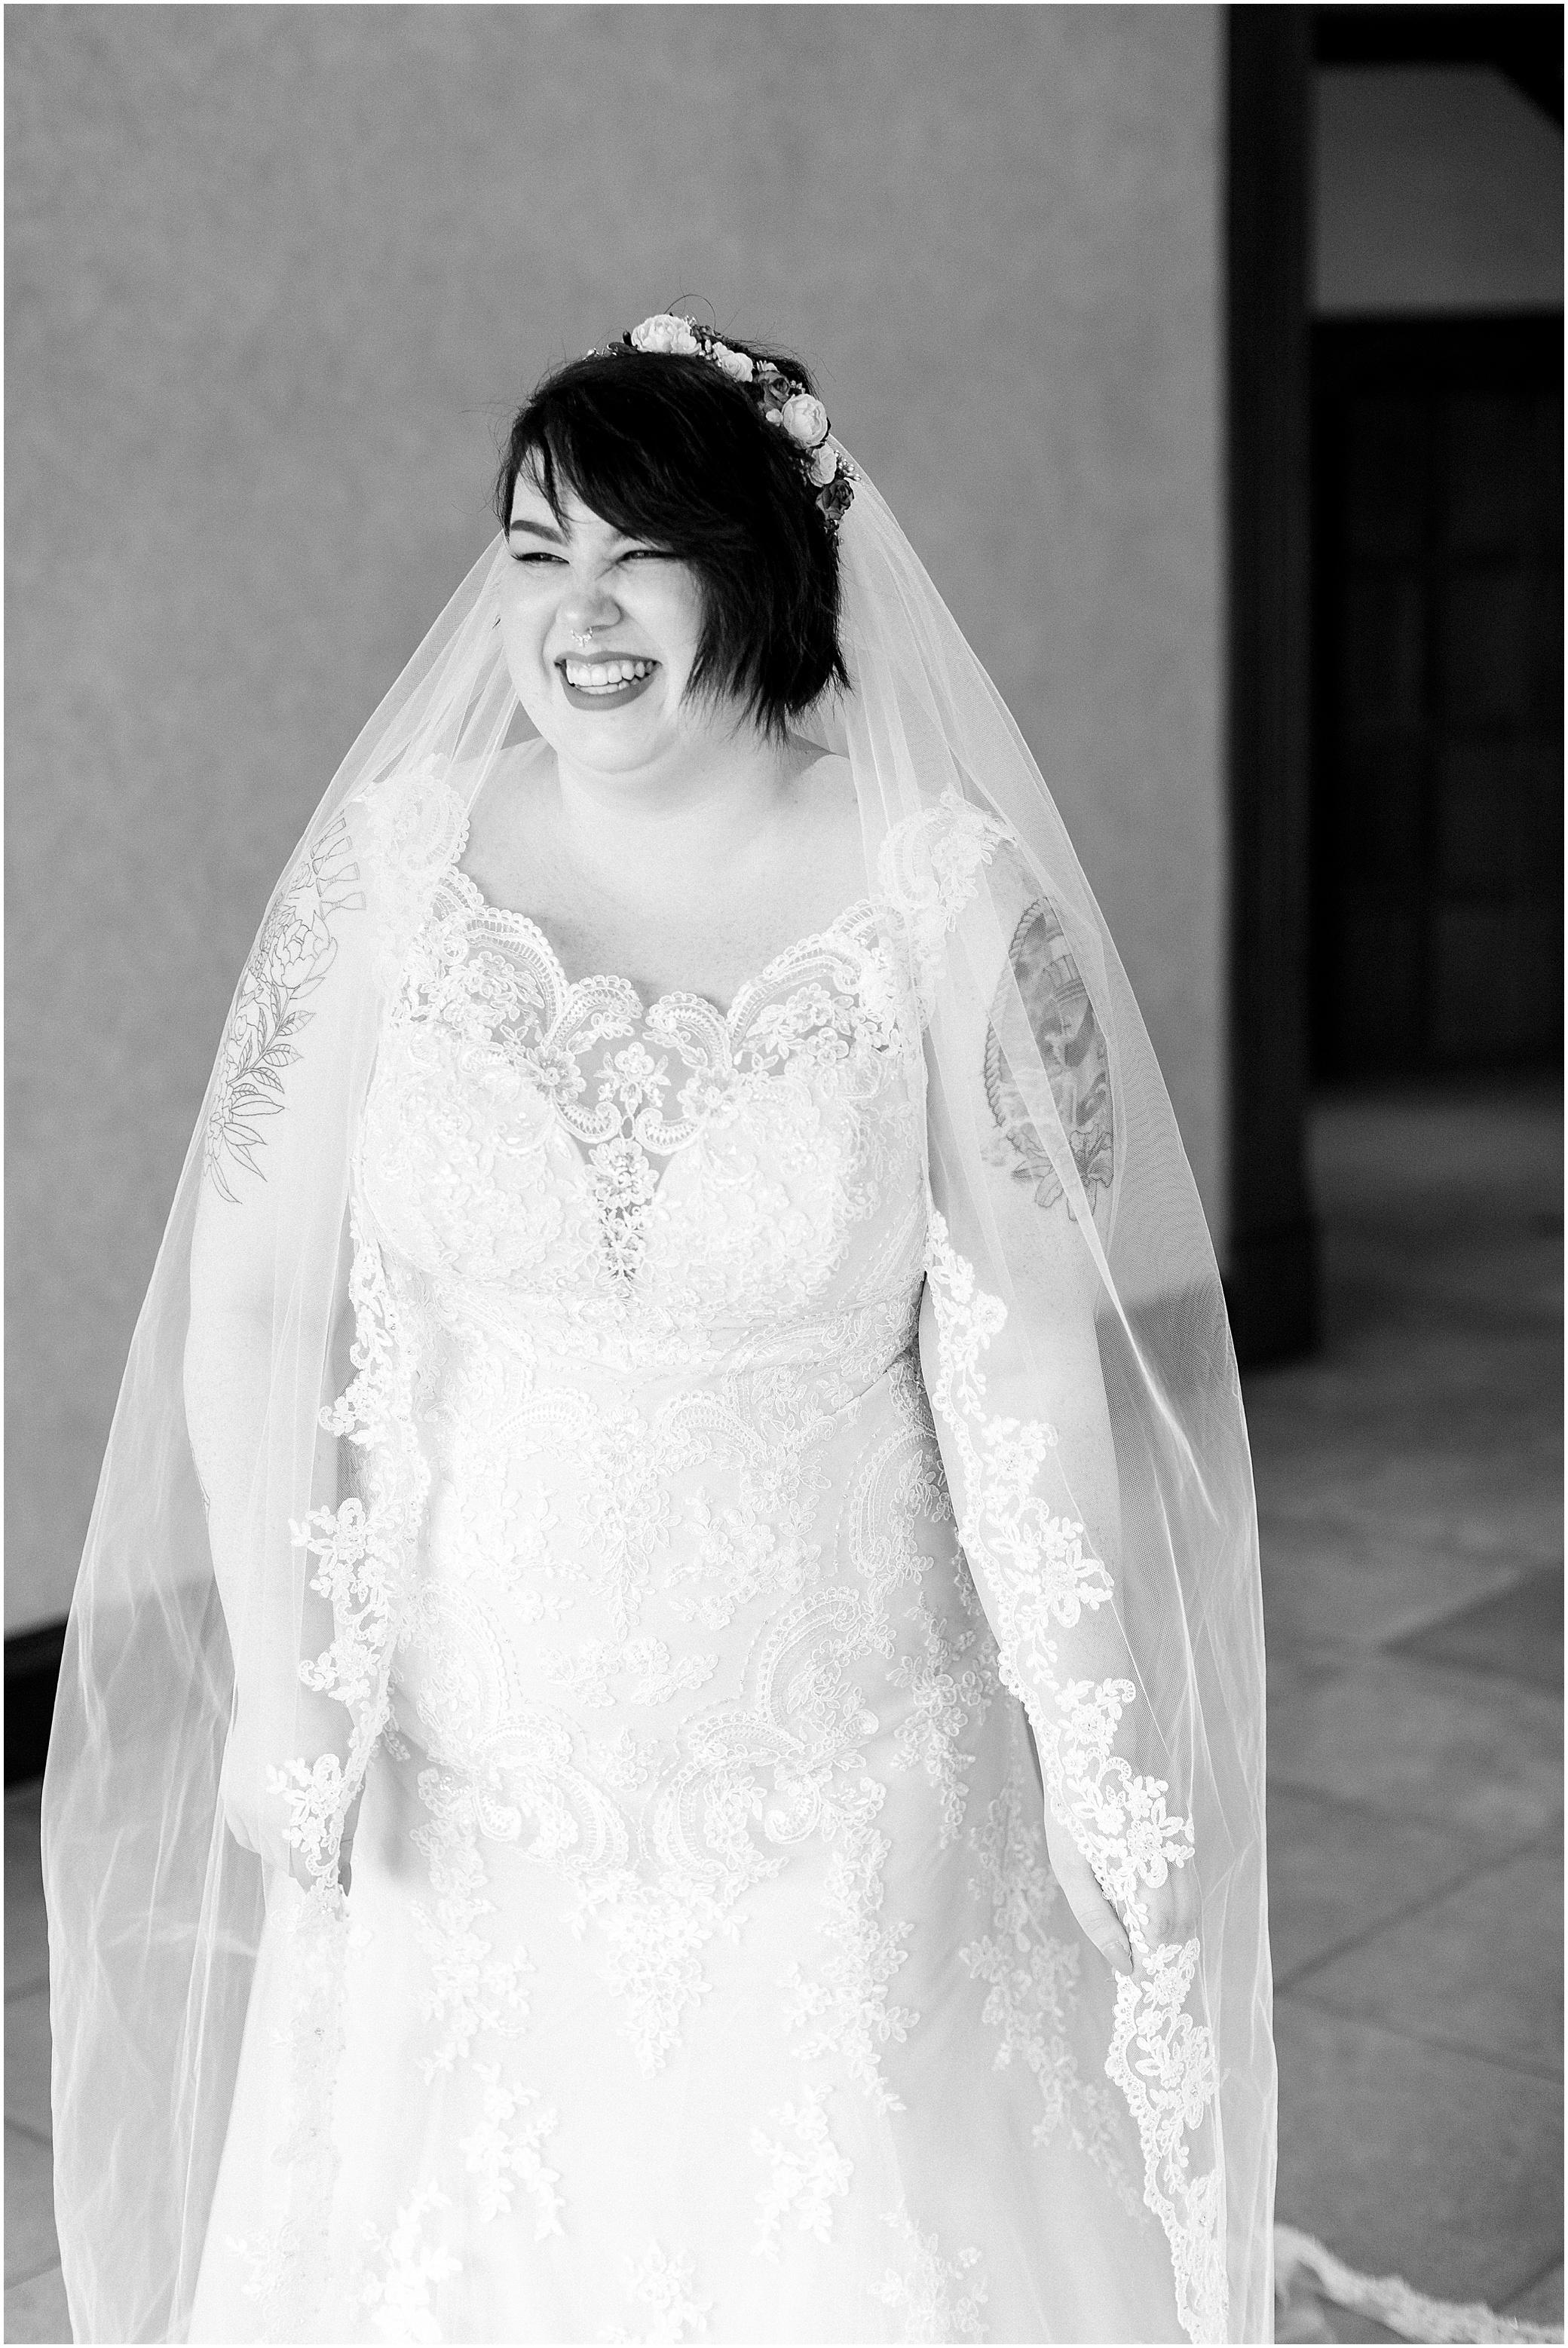 hermitage museum and gardens elopement, studio i do wedding dress, bride getting into wedding dress, vintage bride